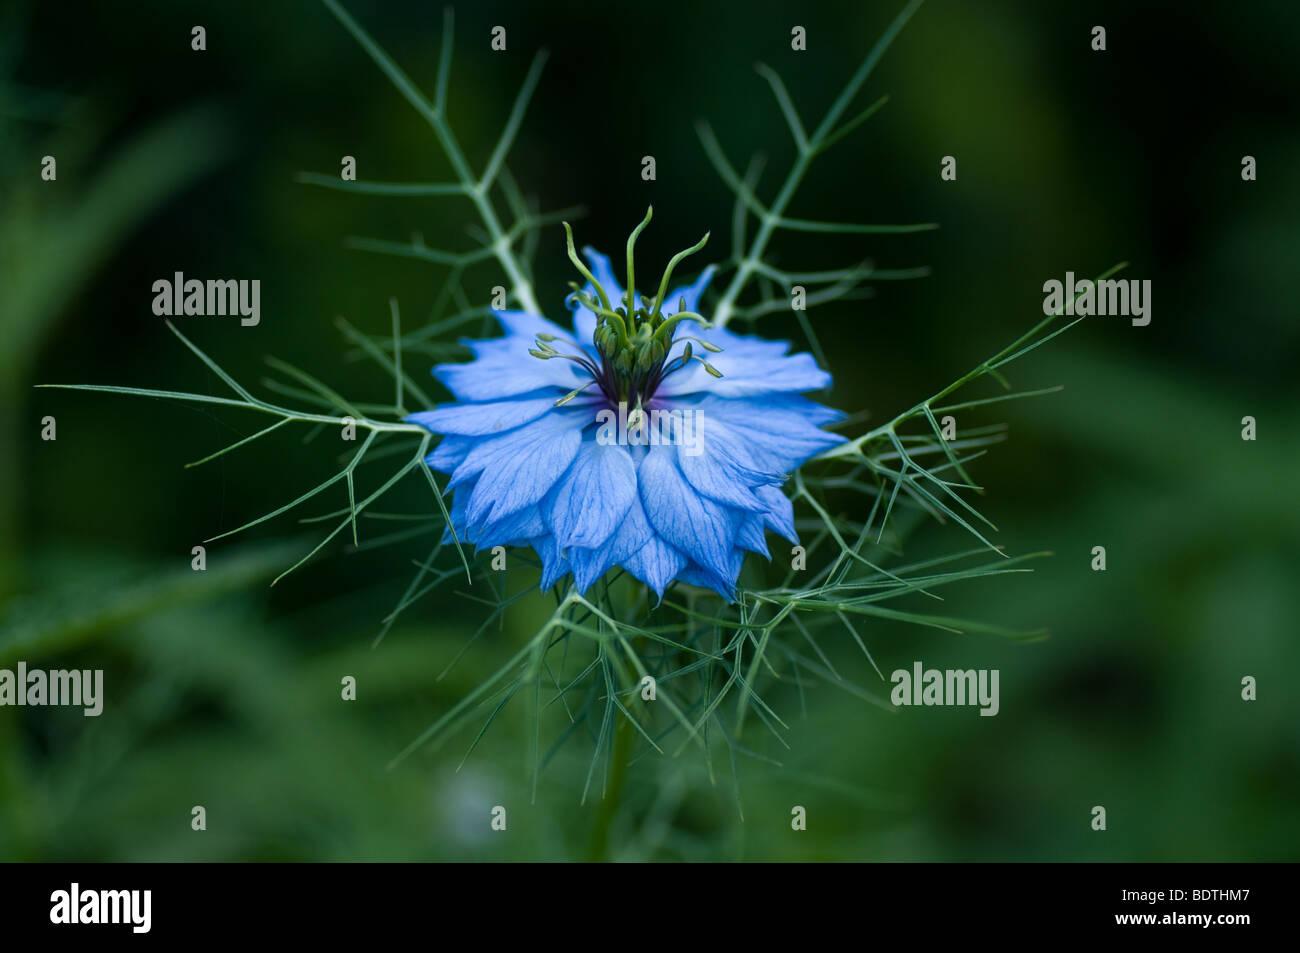 Nigella damascena love-in-a-mist flower single flower with detail Stock Photo